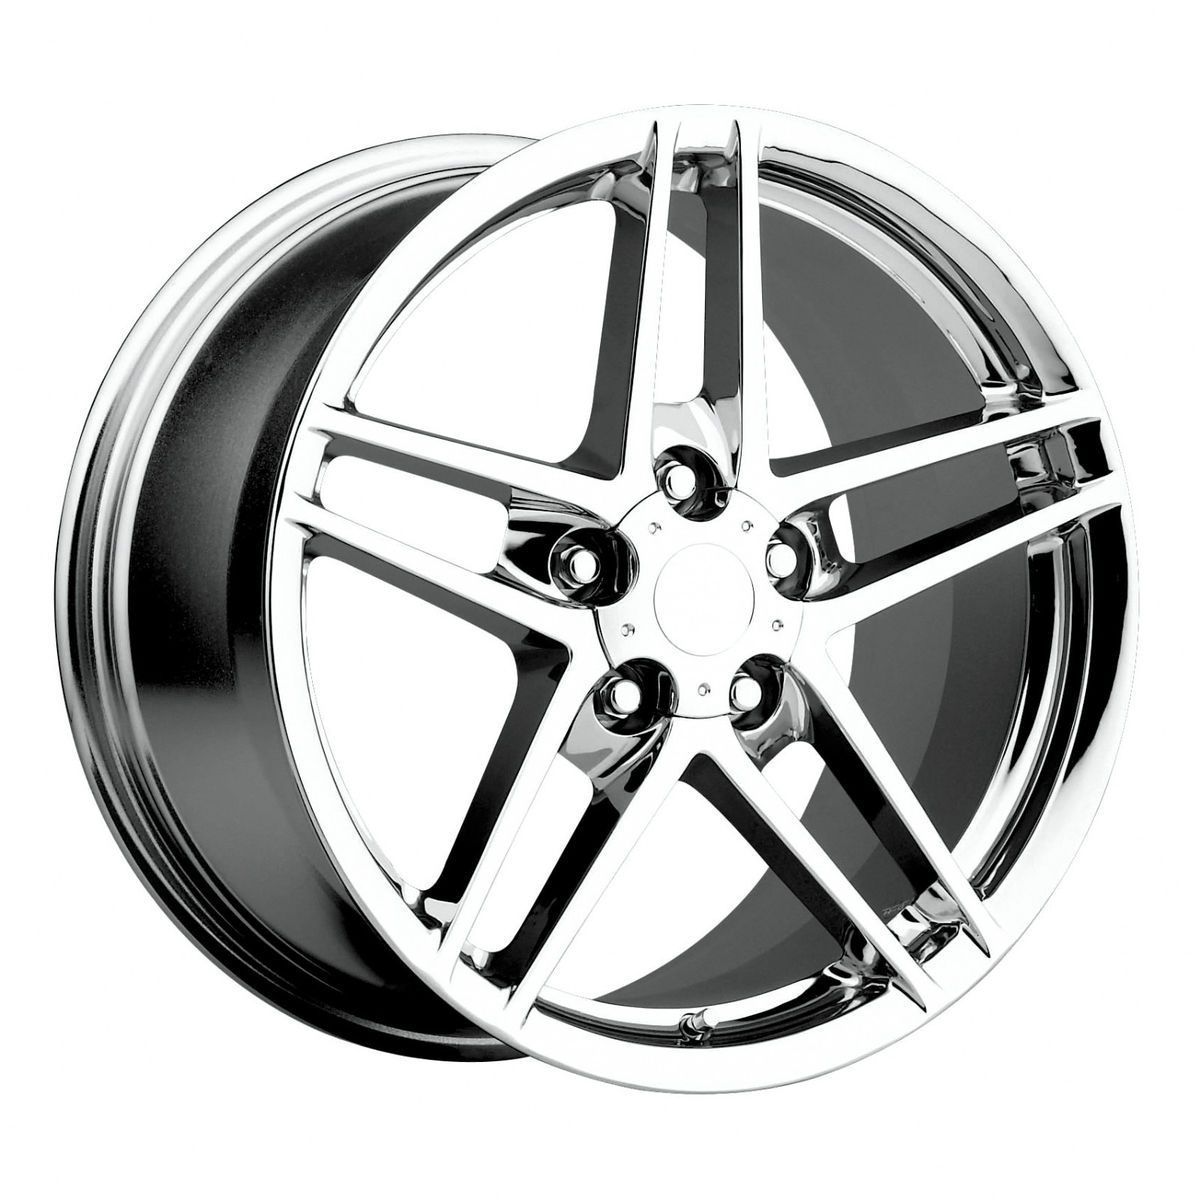 Chevrolet Camaro Corvette Wheels C6 Z06 Rims New ZR1 18x9 5x4 75